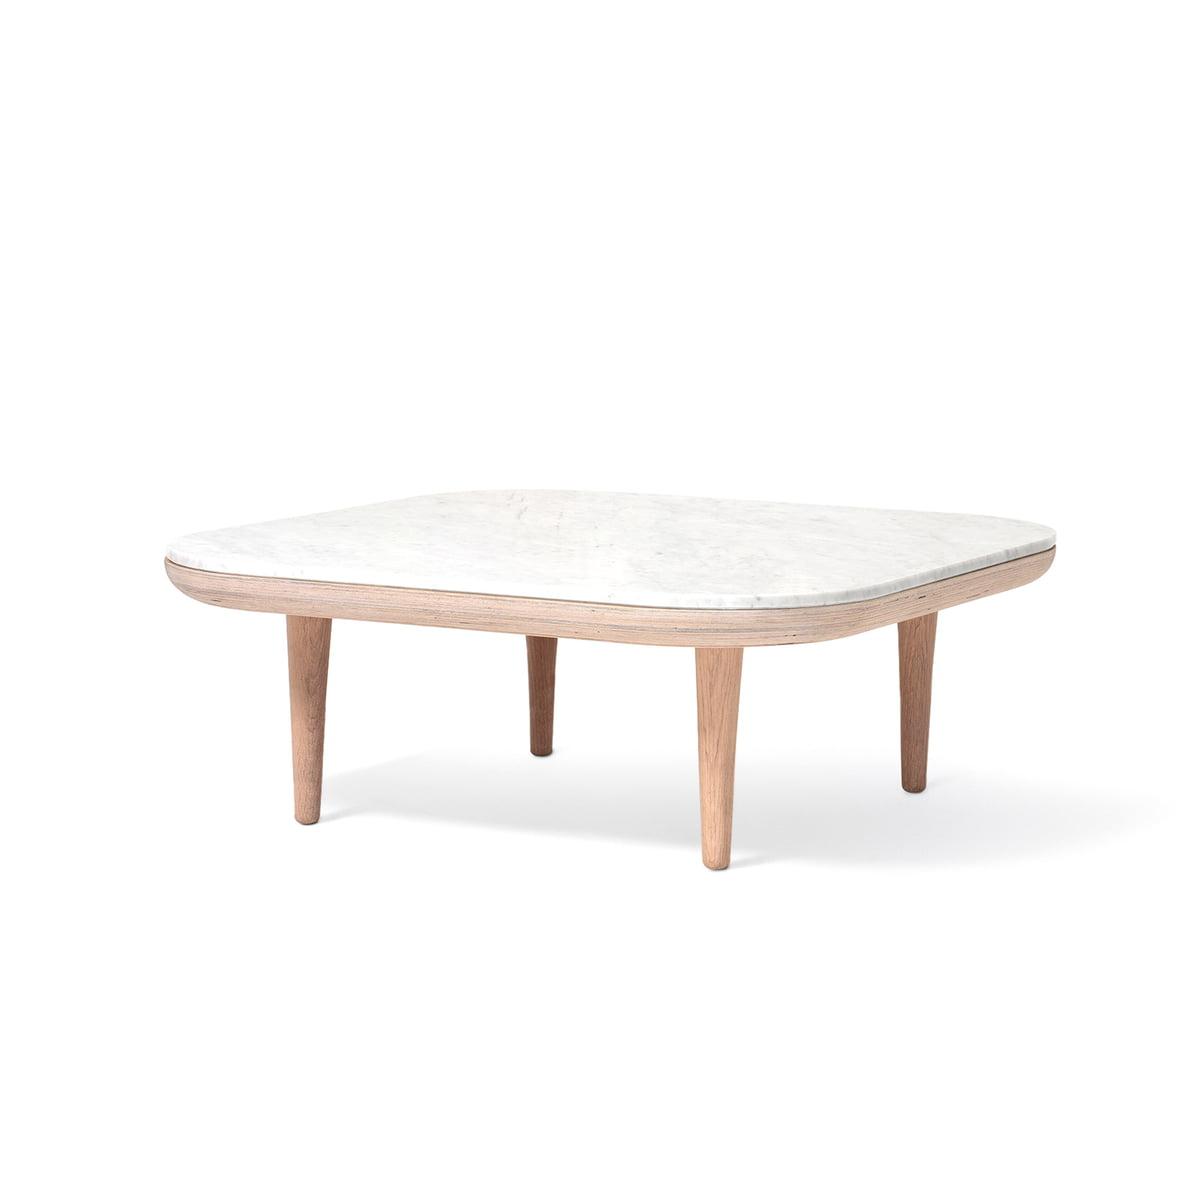 Tradition Table Basse Fly Sc4 80 X 80 Cm Chêne Blanc Marbre Bianco Carrara